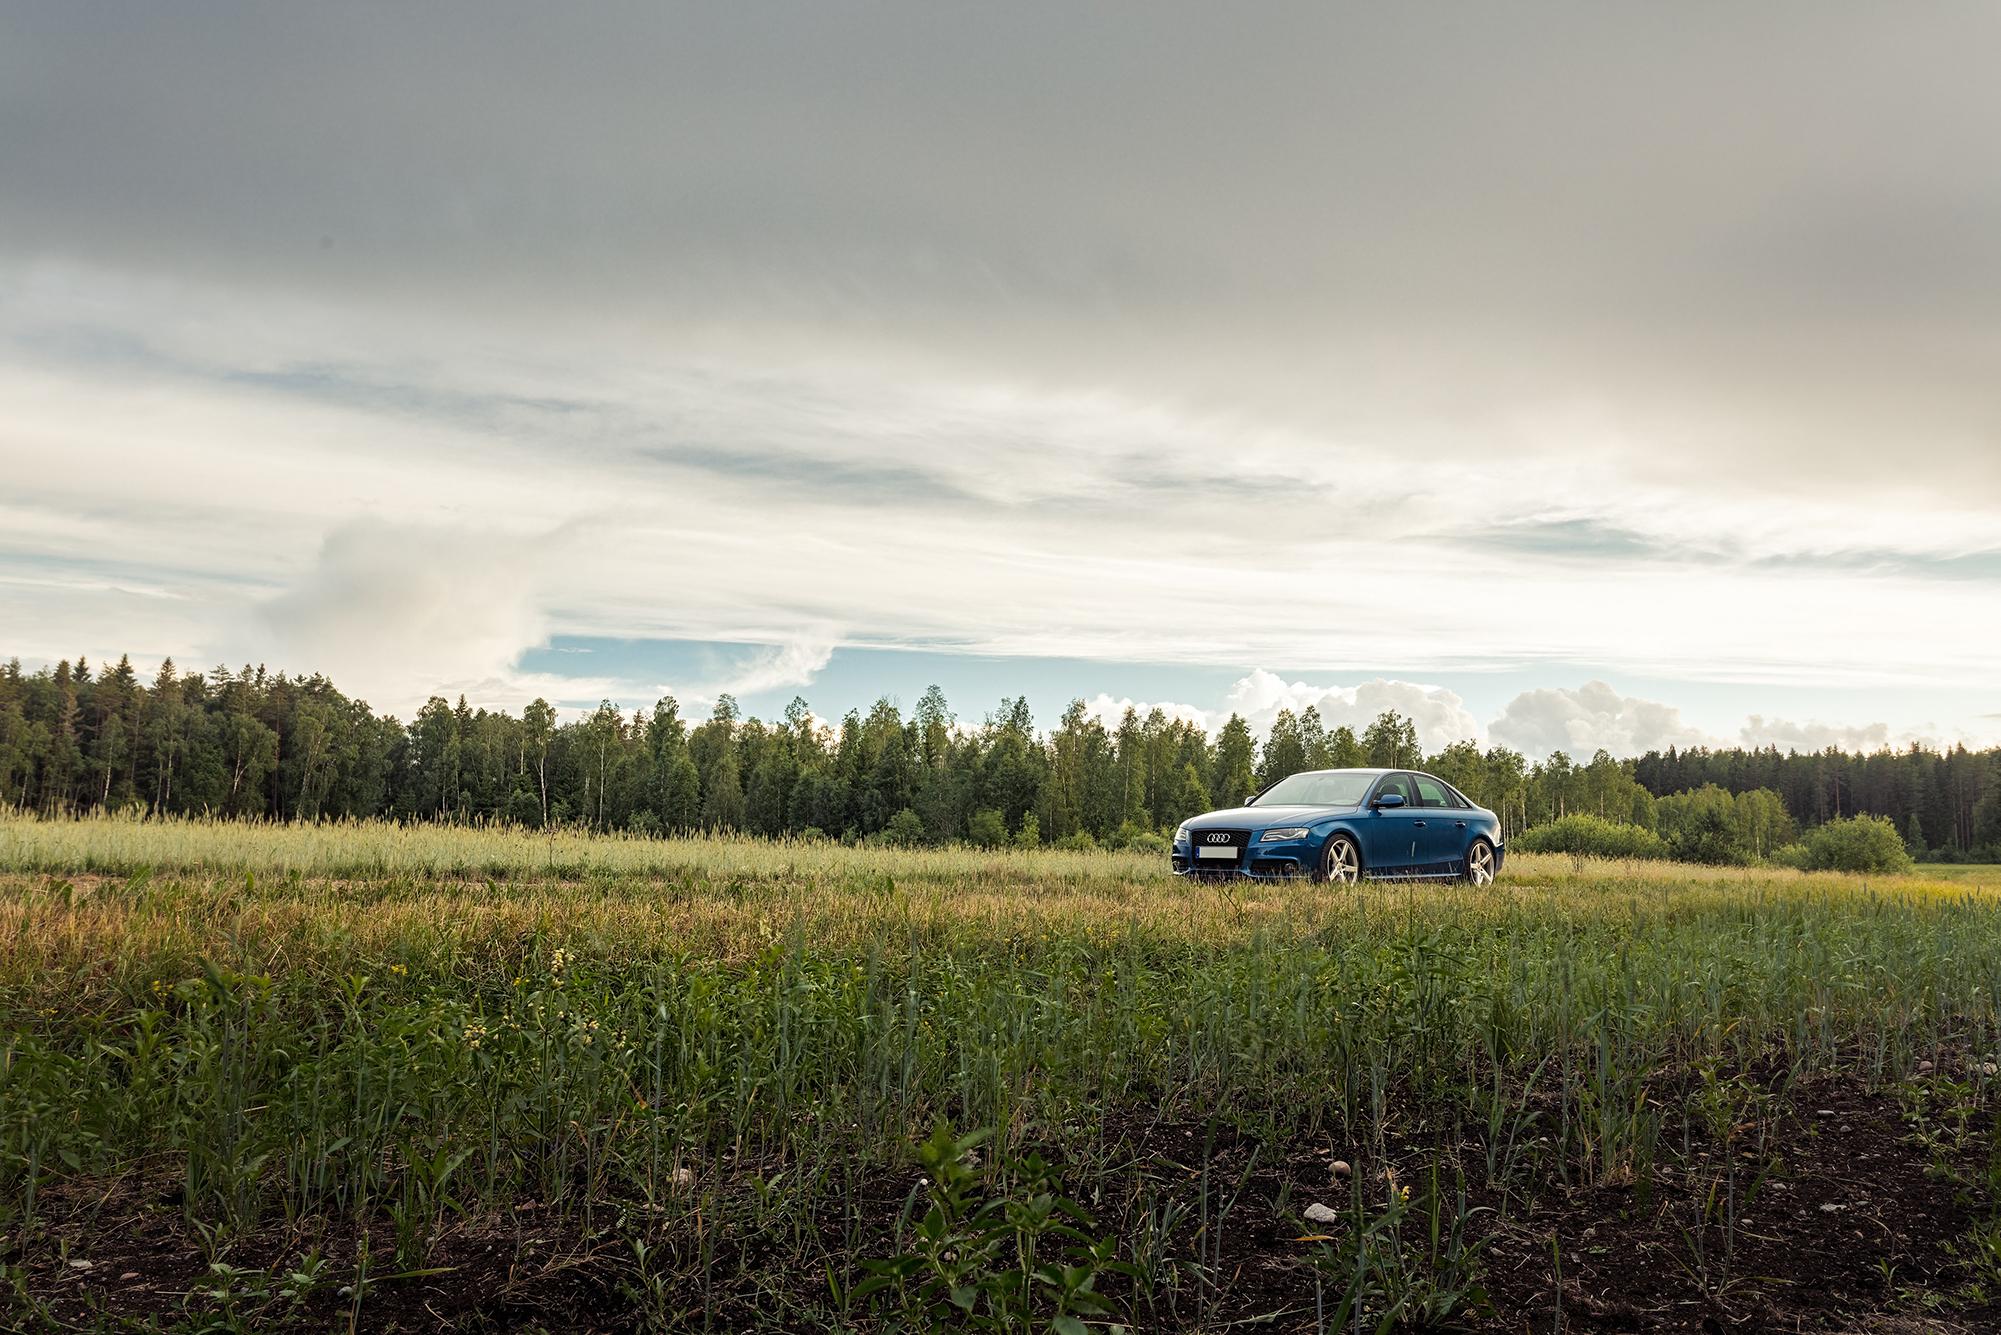 used car loan vehicle